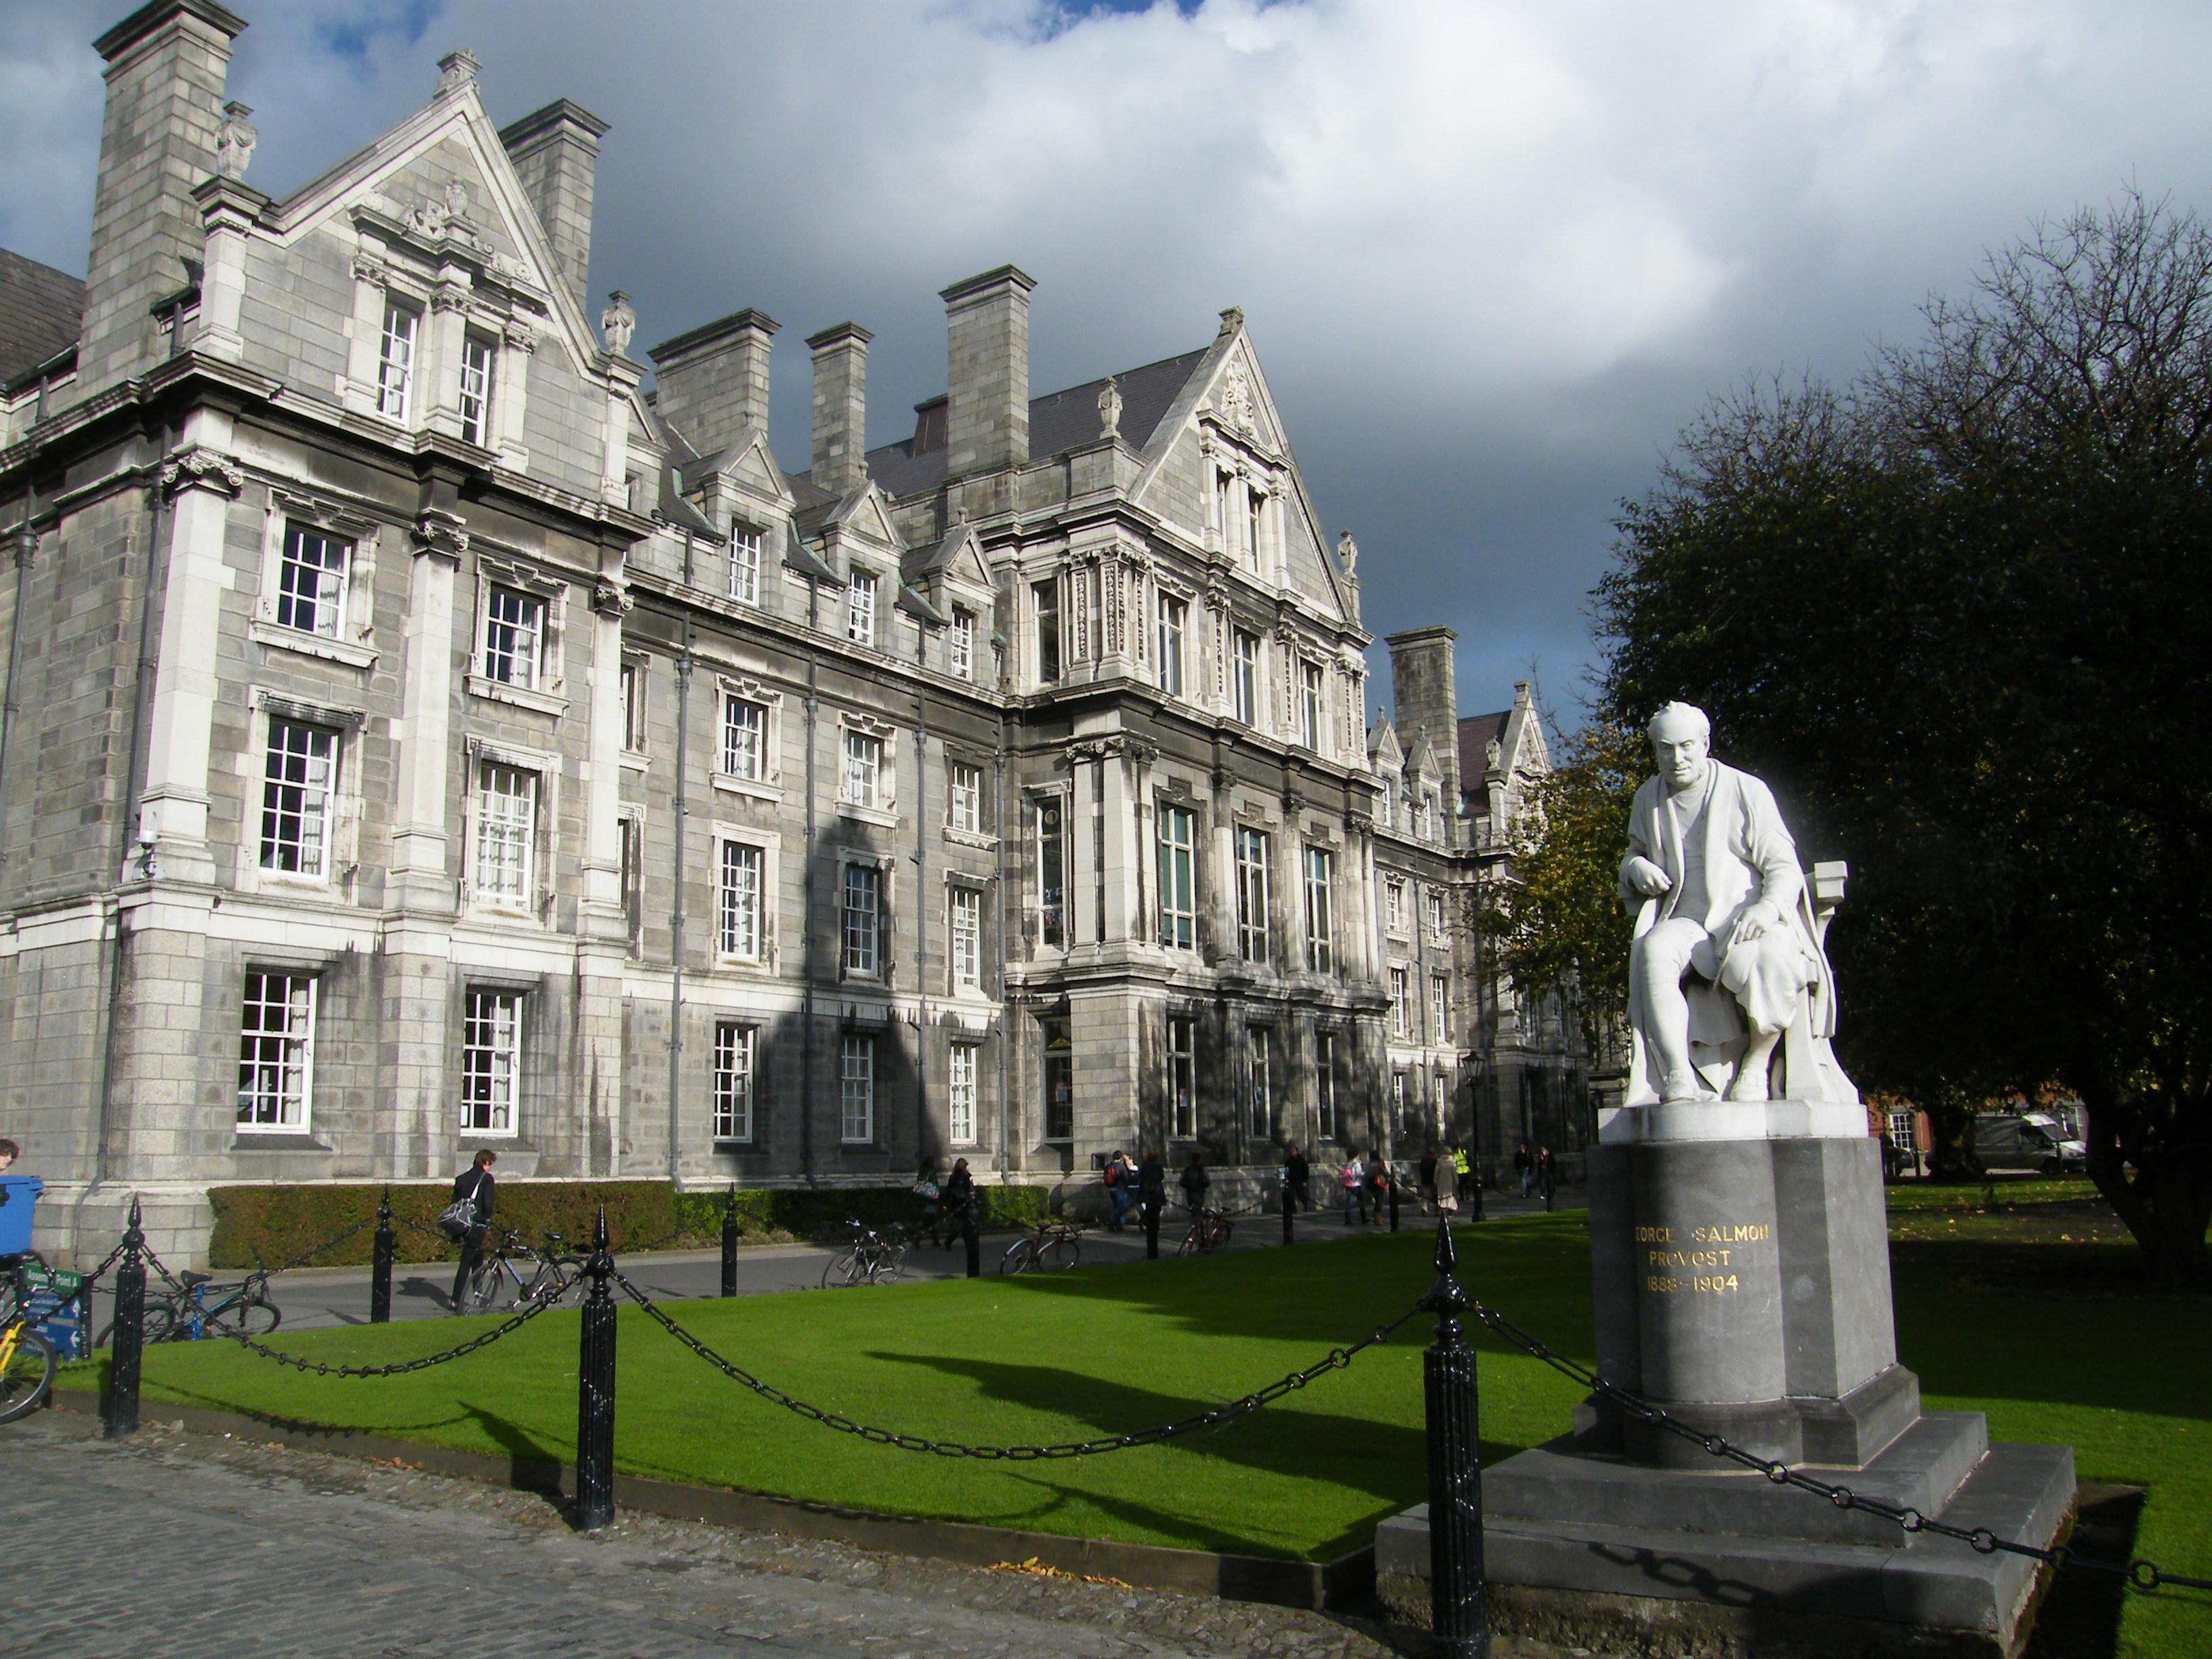 https://commons.wikimedia.org/wiki/File:Trinity_College_Dublin_4.jpg